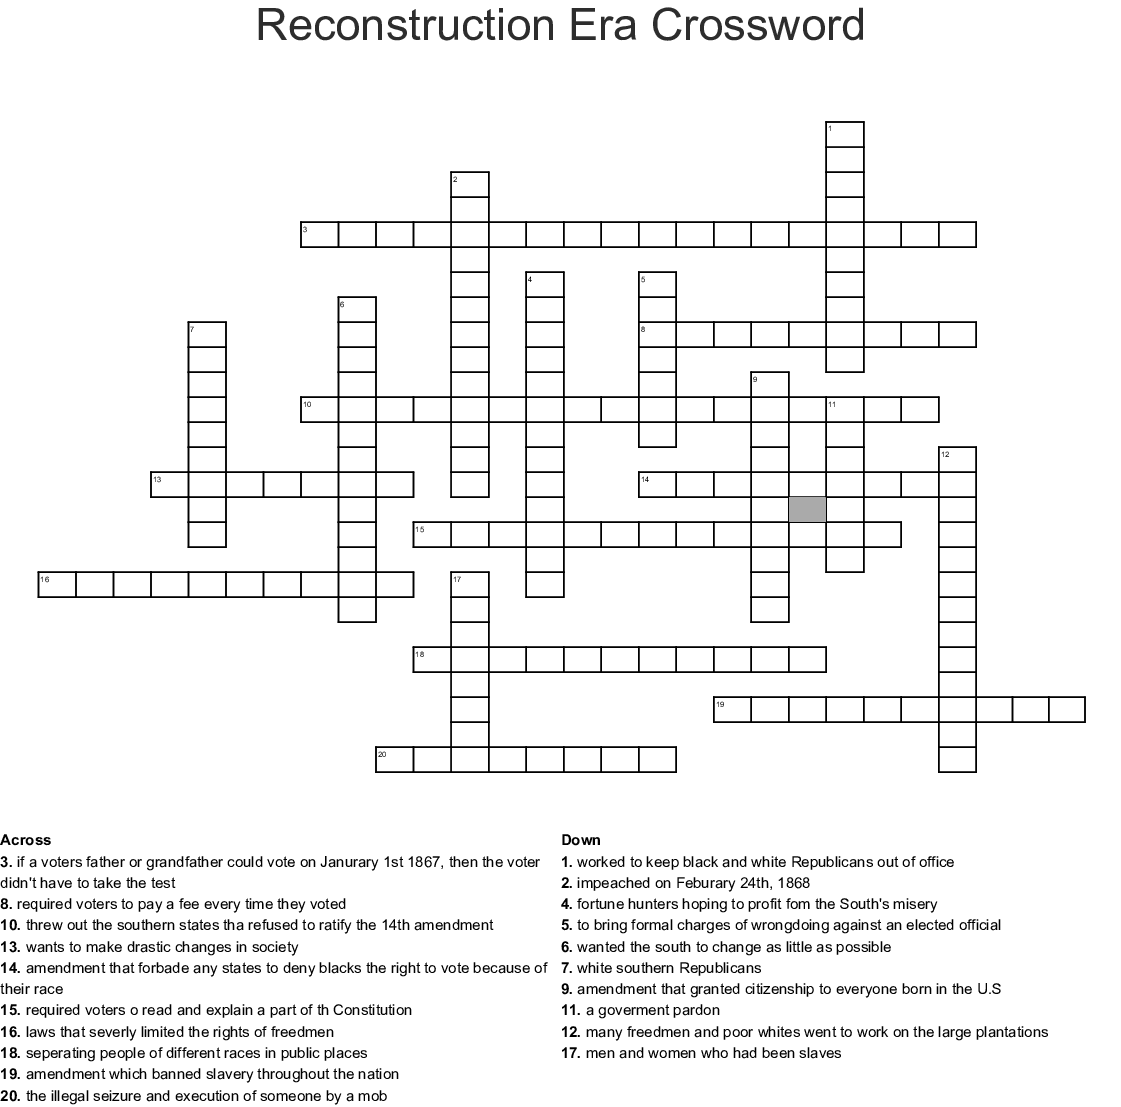 APUSH Period 5 Crossword - WordMint